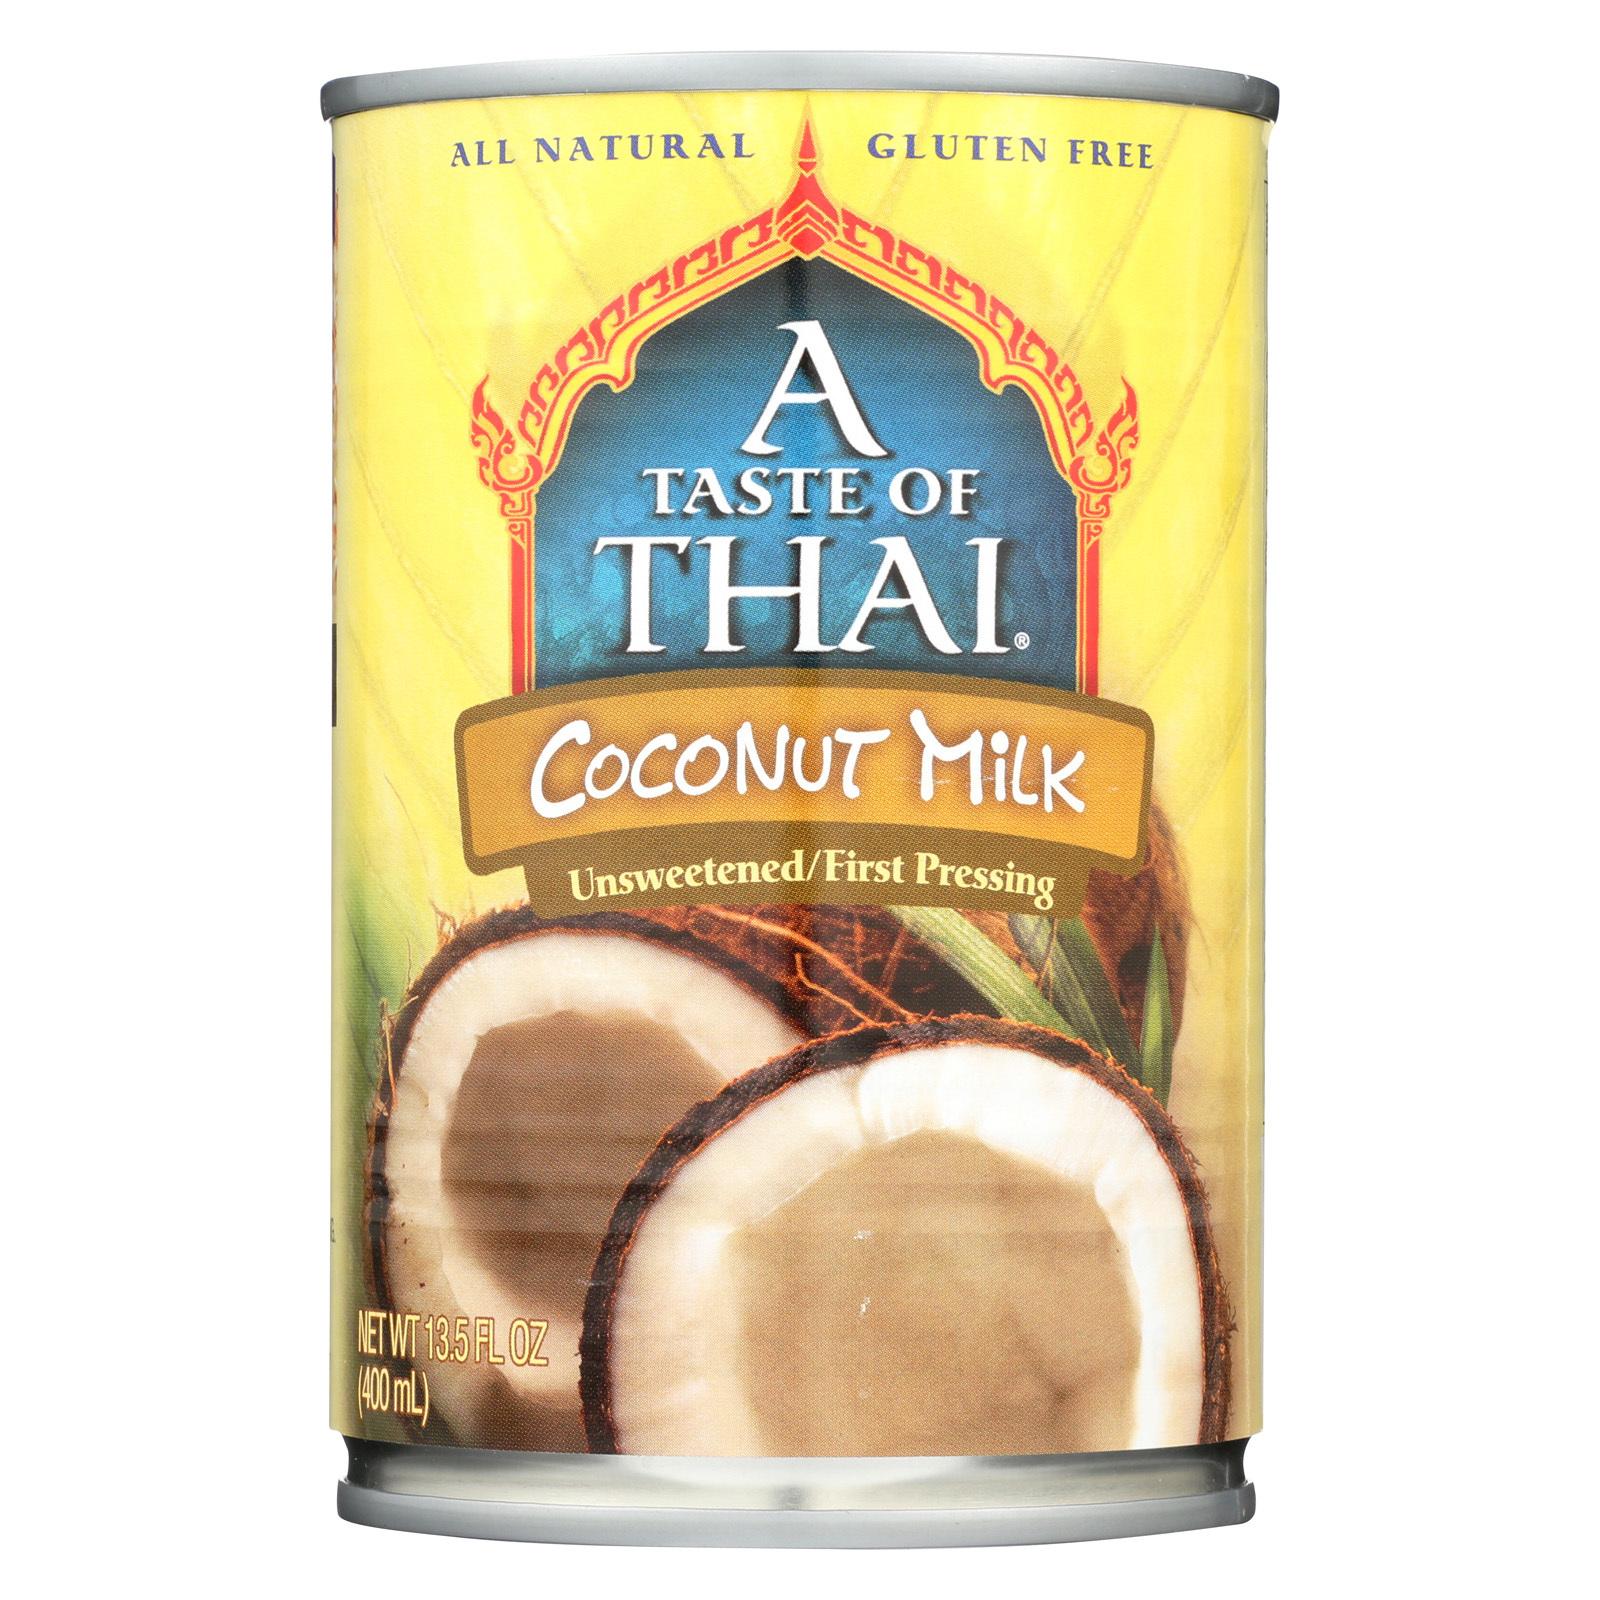 Taste of Thai Coconut Milk - Case of 12 - 13.5 Fl oz.